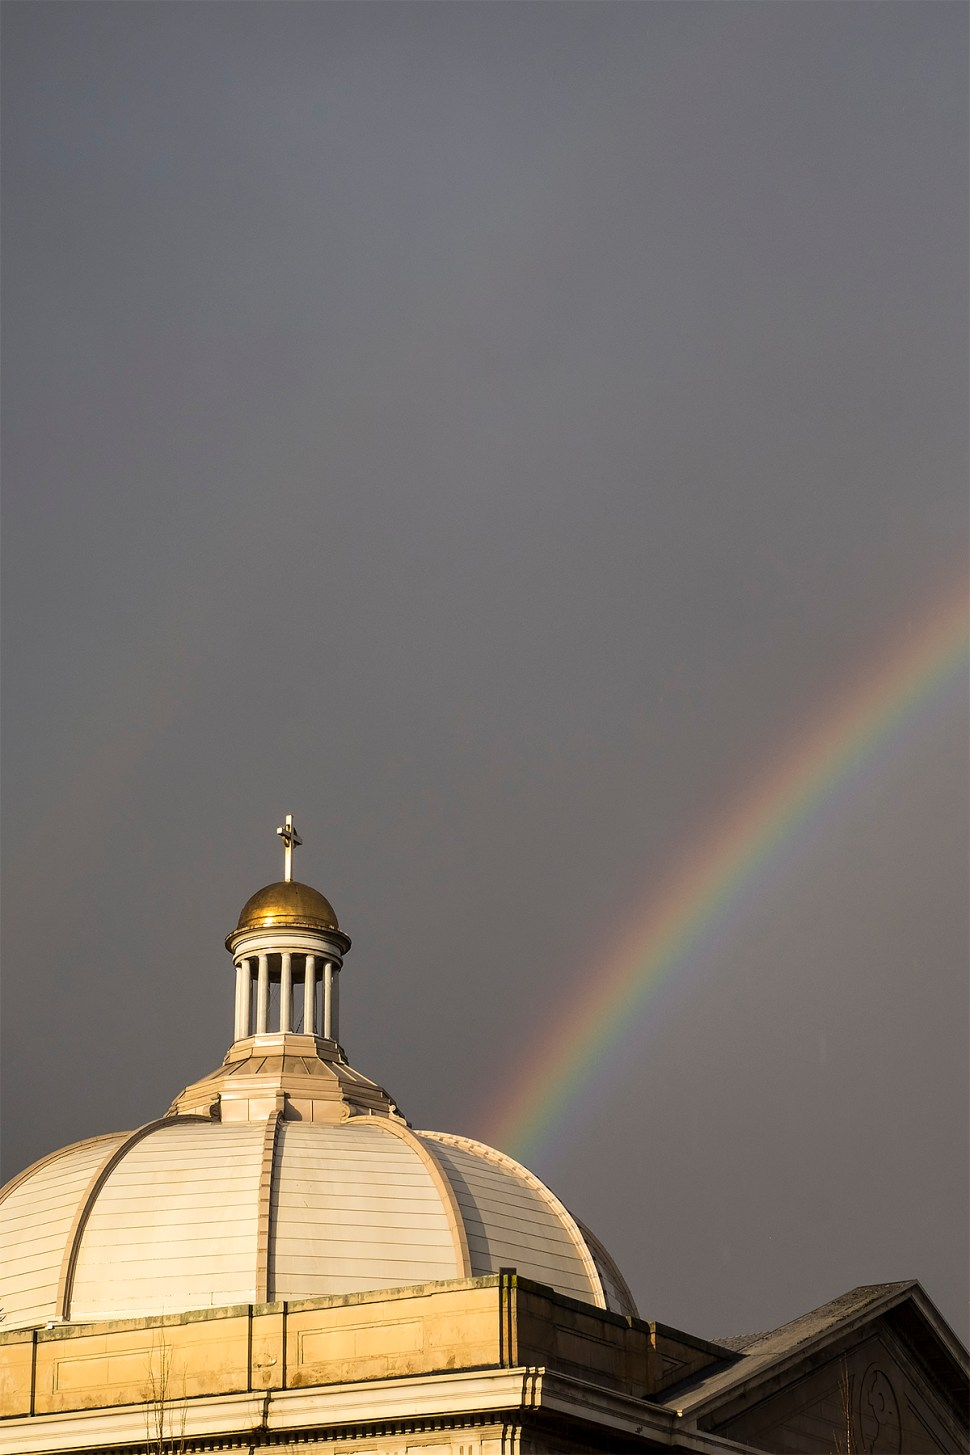 rainbow_DSCF0810.jpg